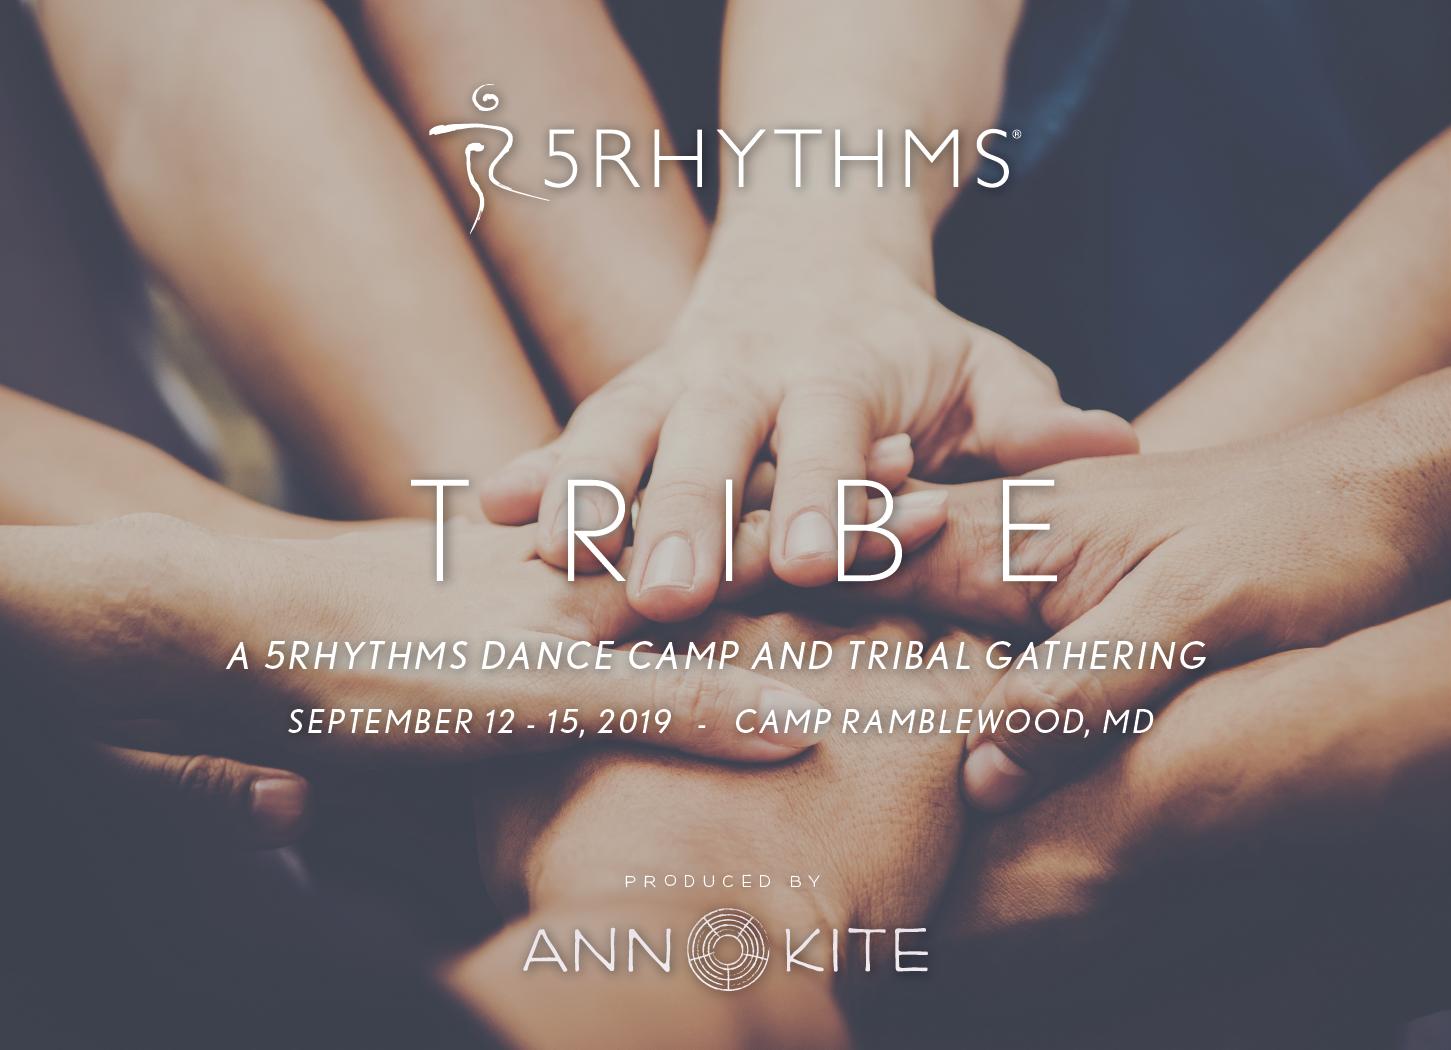 Tribe_Artboard 1.png